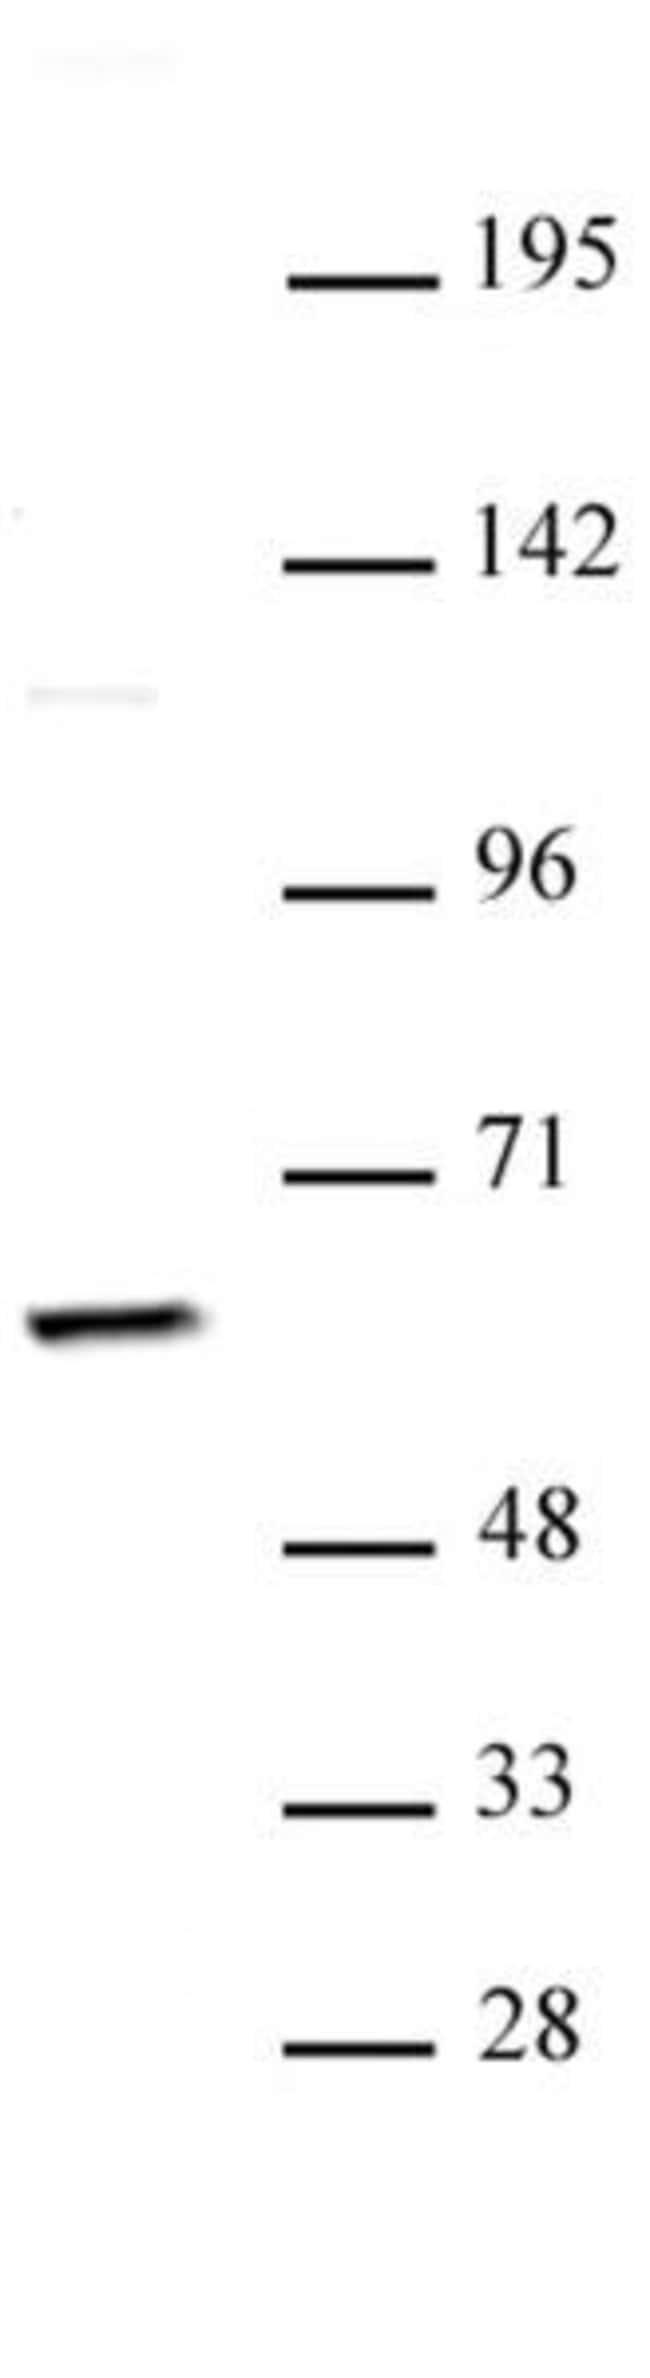 PKM2 Rabbit anti-Human, Unconjugated, Polyclonal, Active Motif:Antibodies:Primary